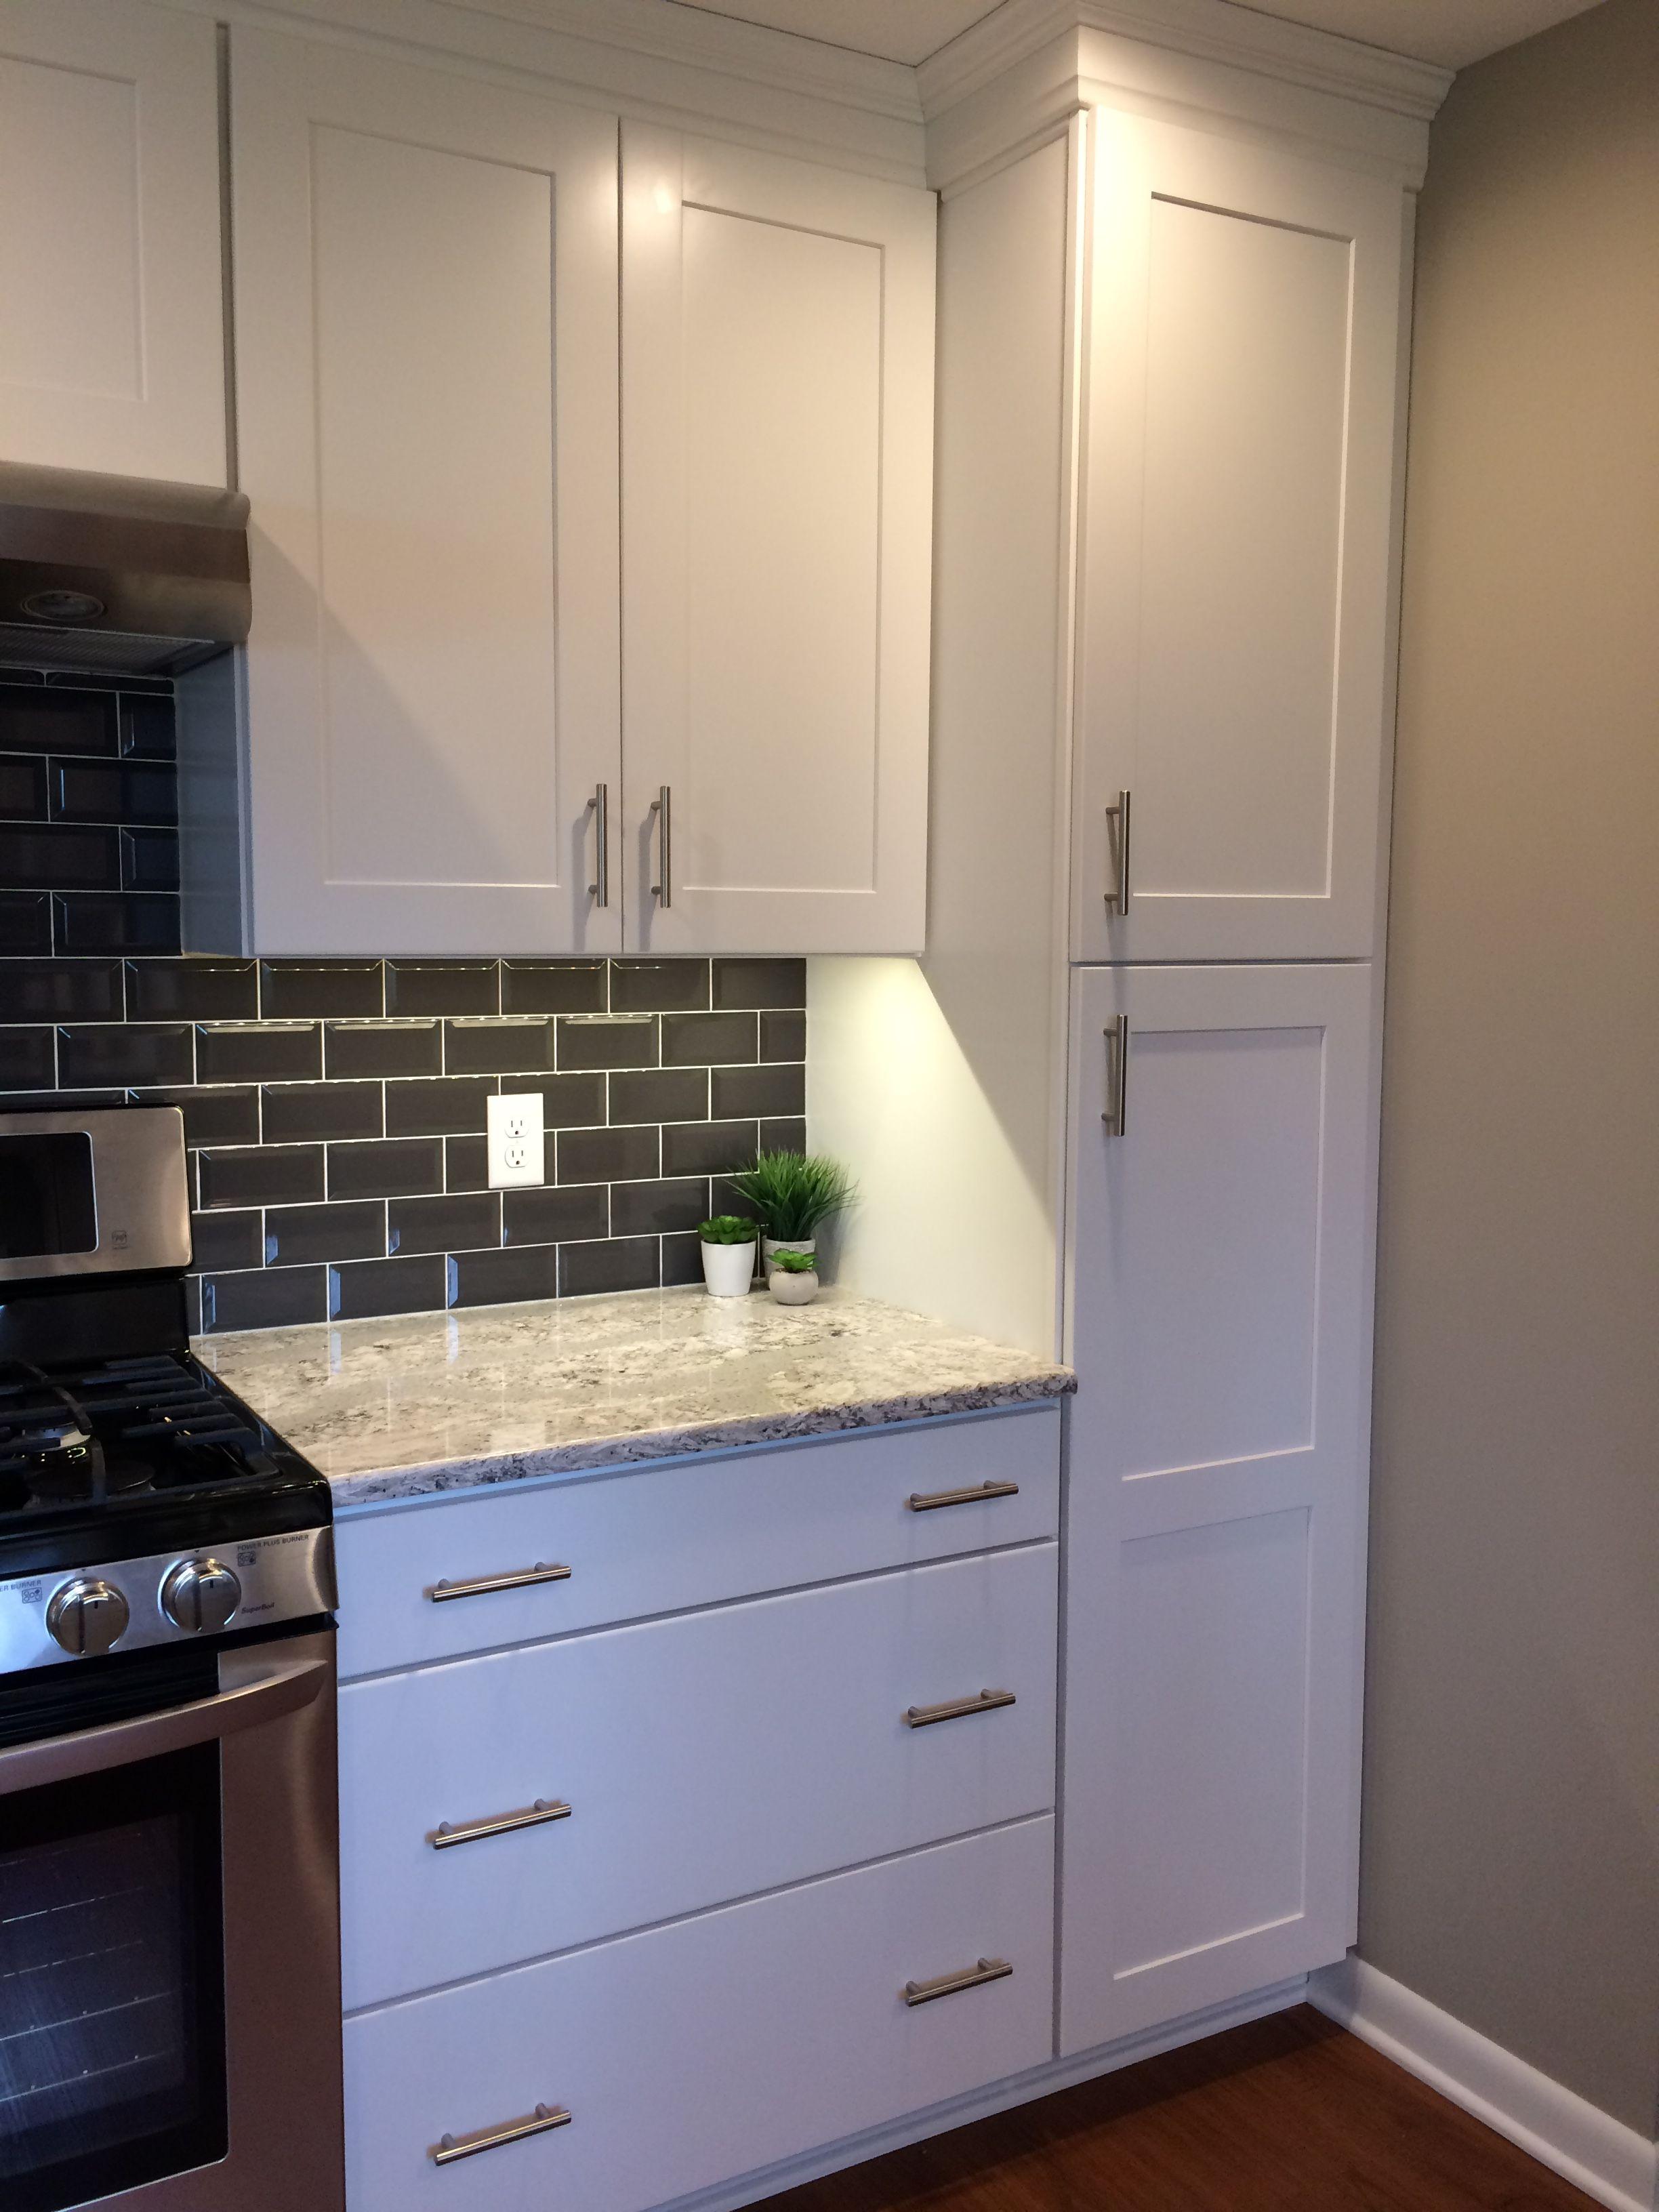 Summerhill Cambria Quartz White Cabinets With Drawers